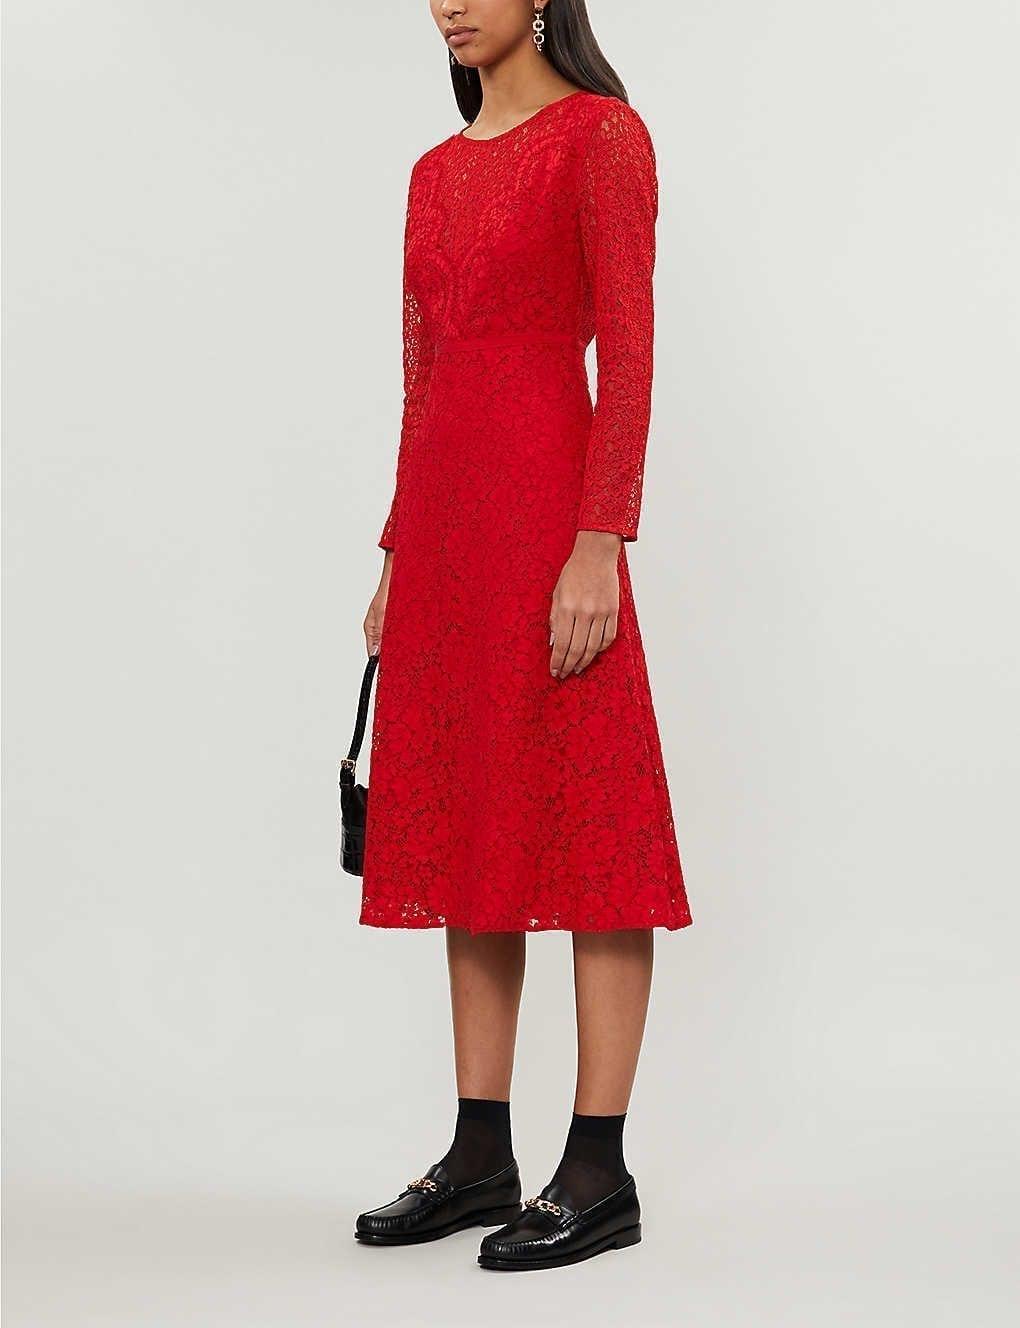 CLAUDIE PIERLOT Rabonie Floral Stretch-lace Midi Dress